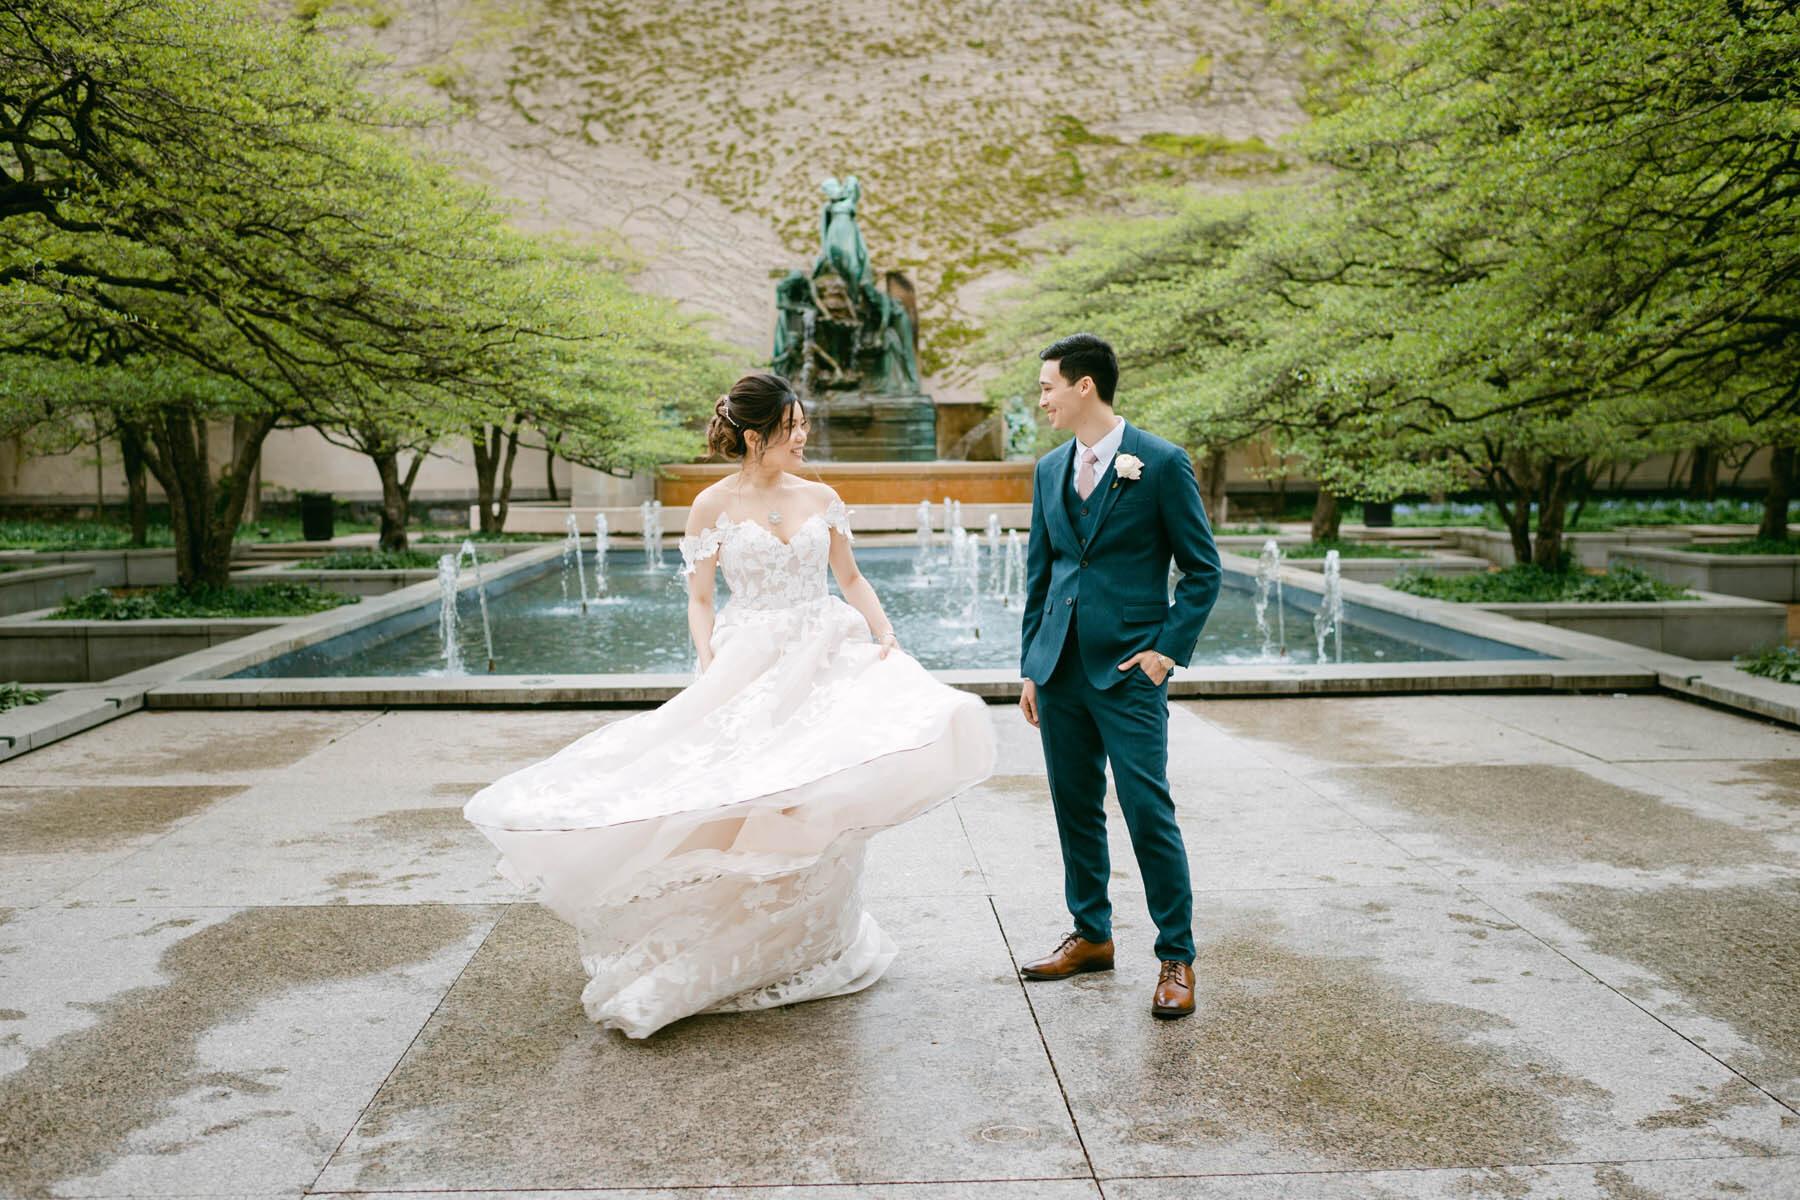 Art Institute dancing bride